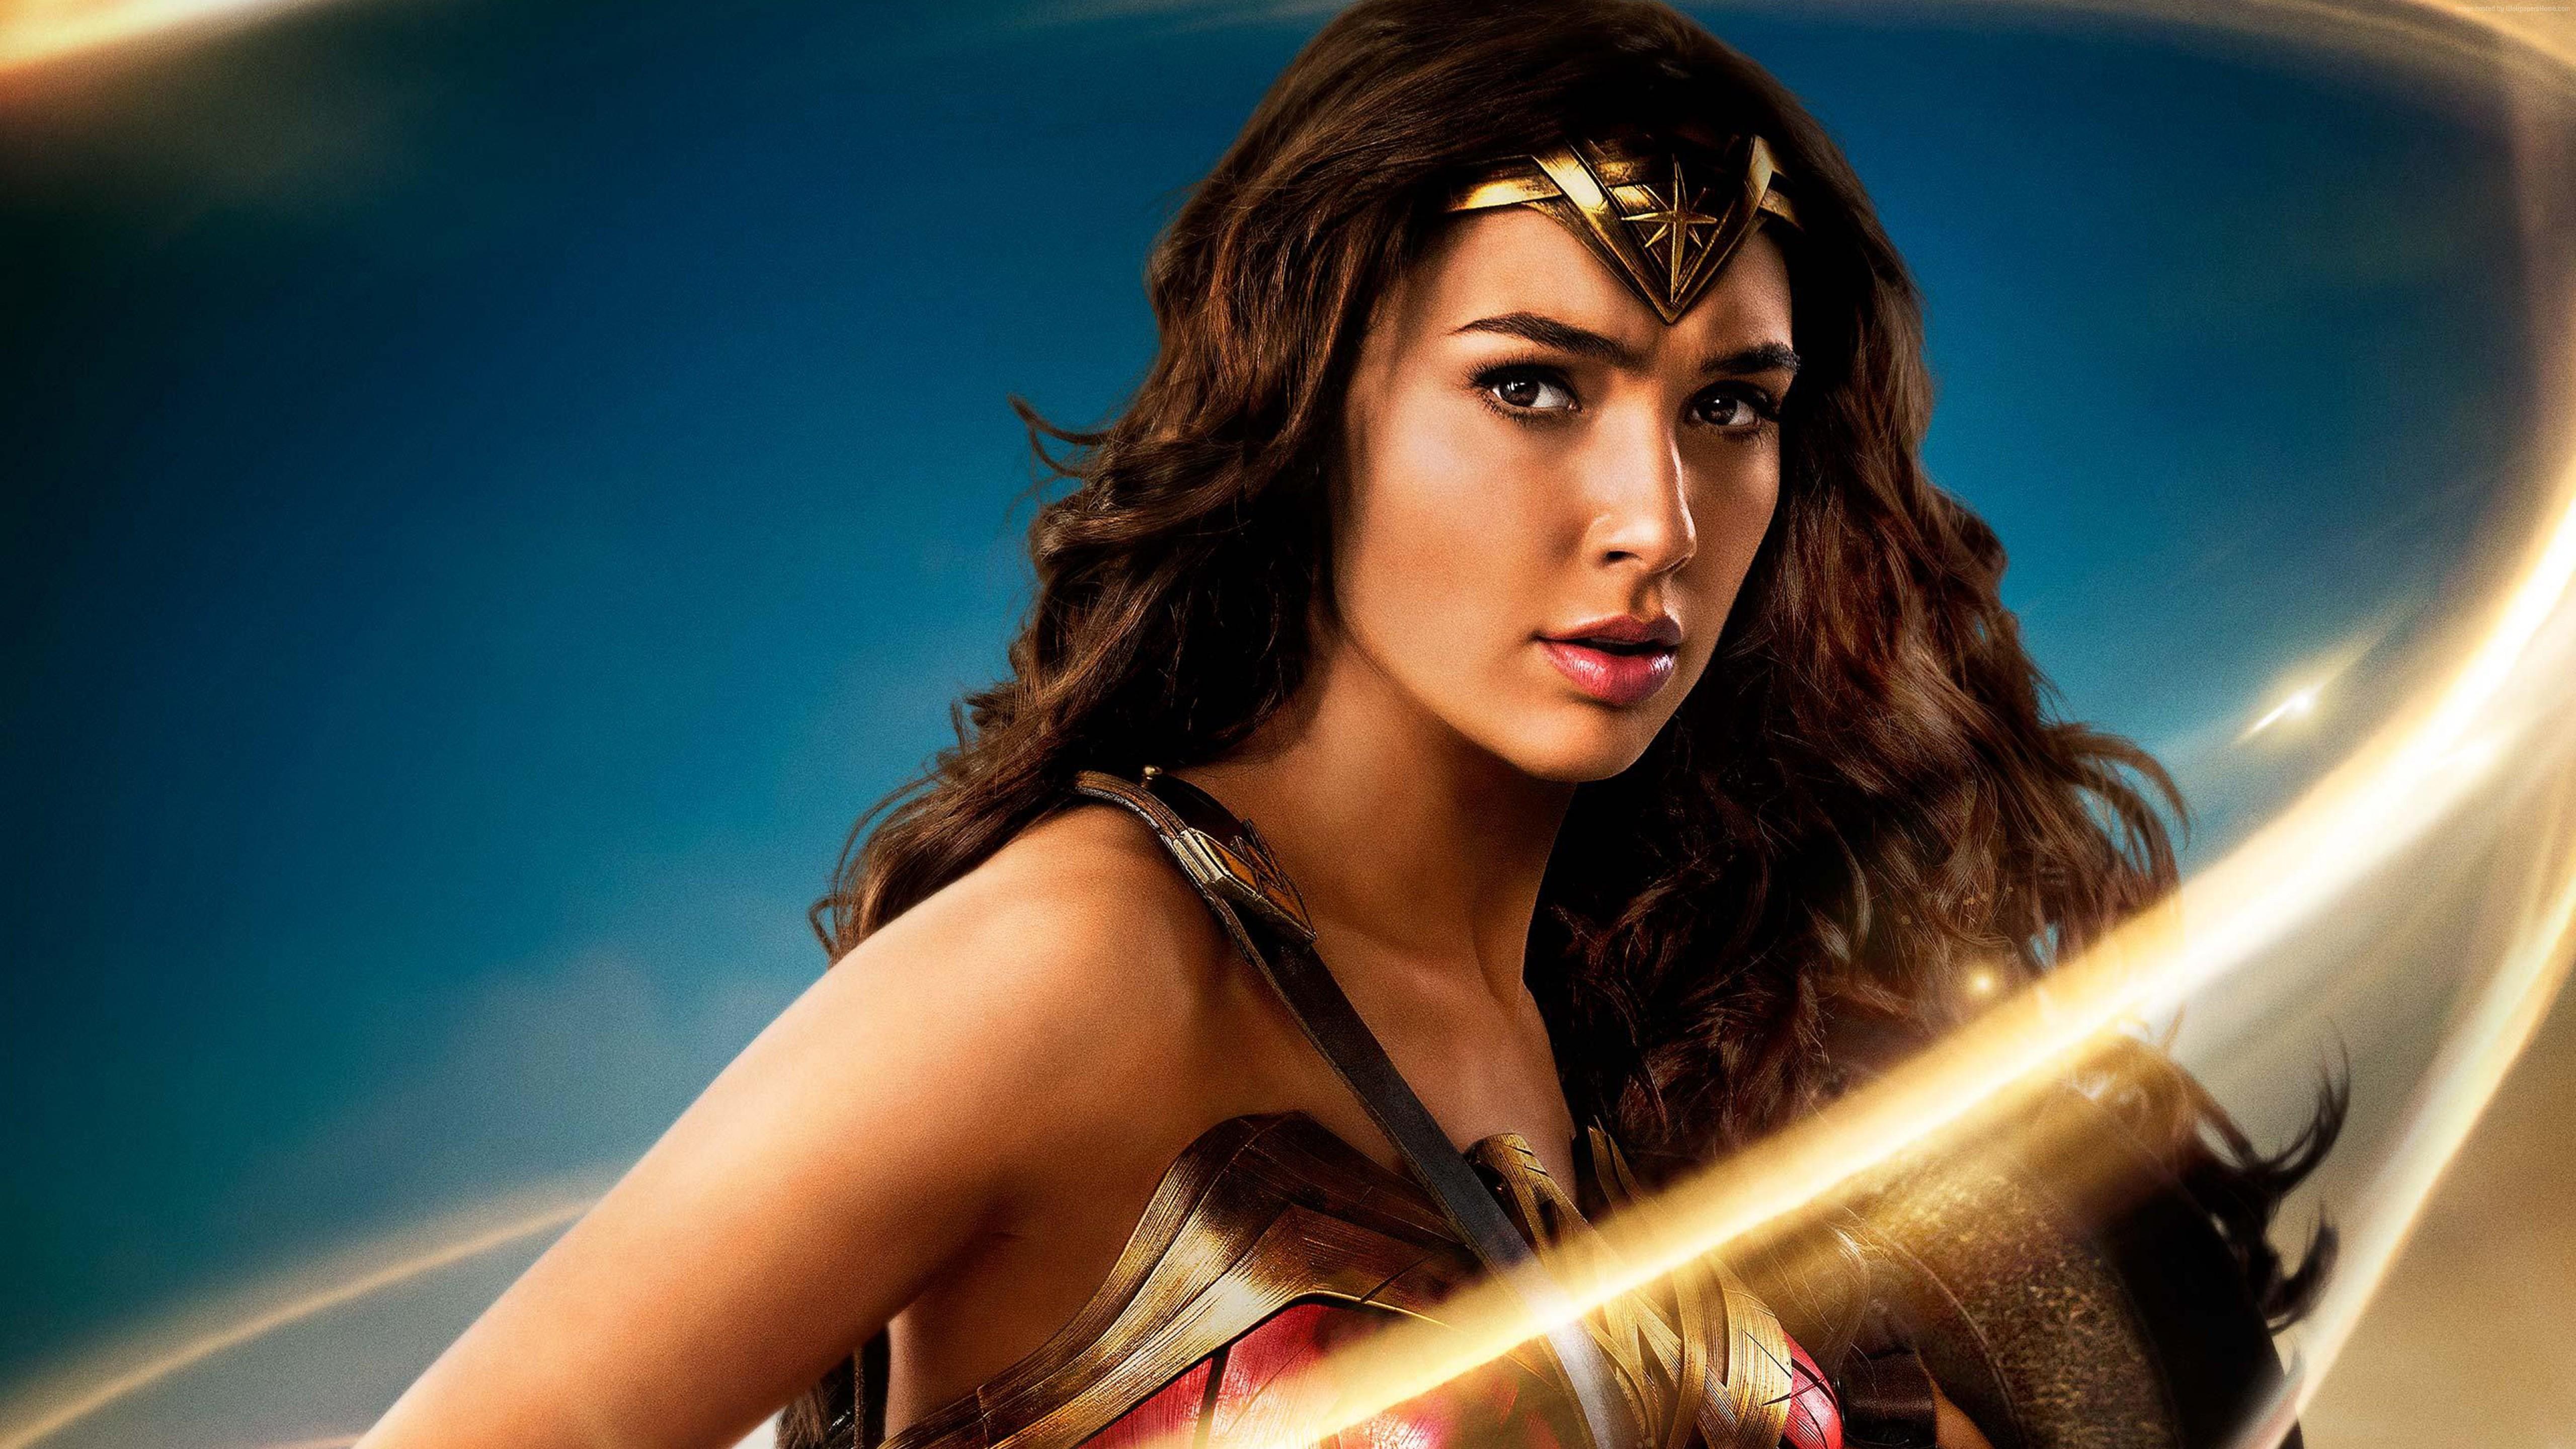 People 5120x2880 superhero Wonder Woman Gal Gadot